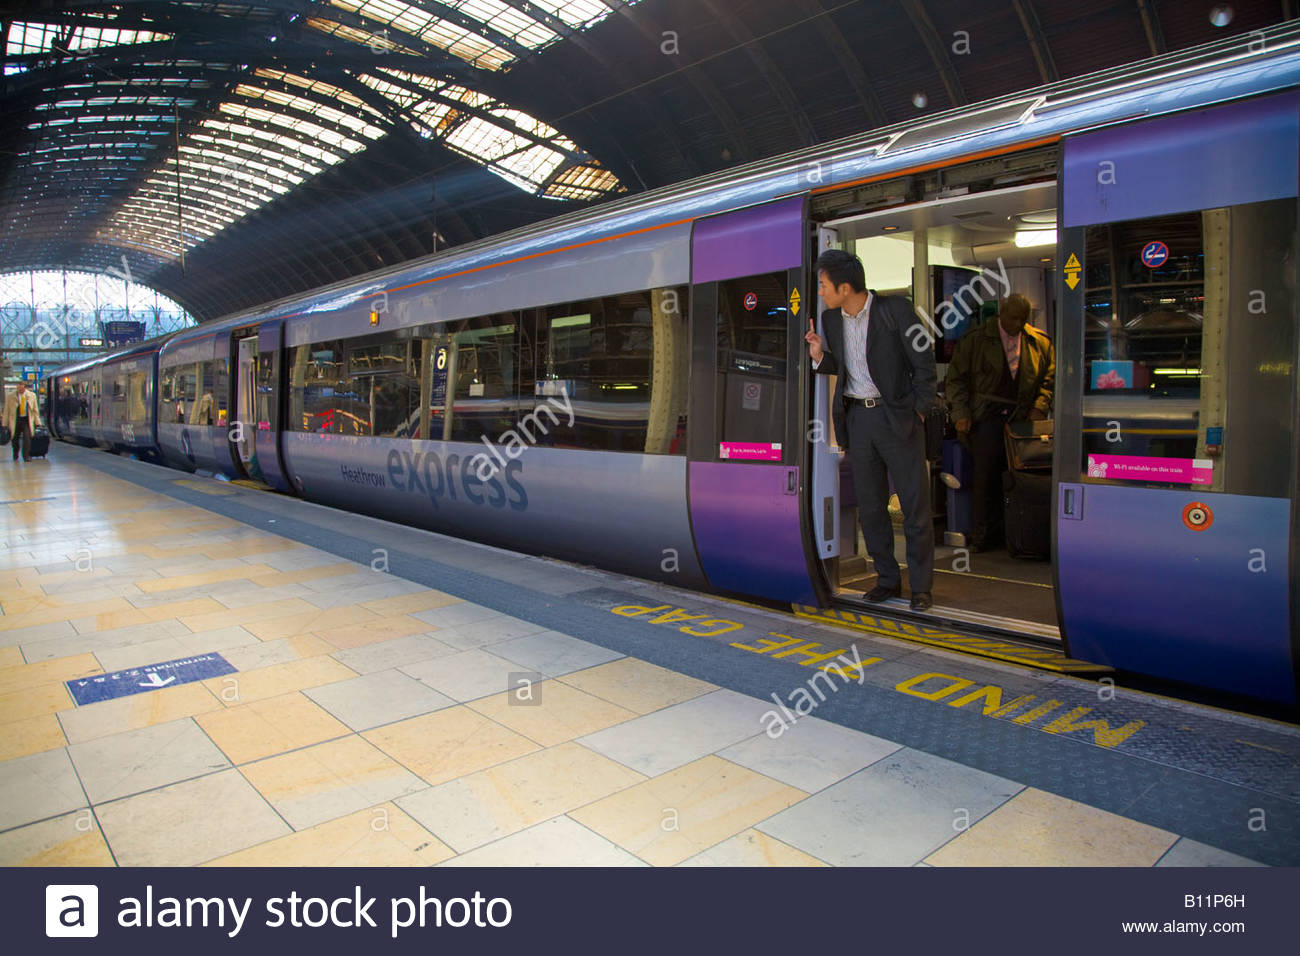 Heathrow Express Train at London Paddington Station London UK